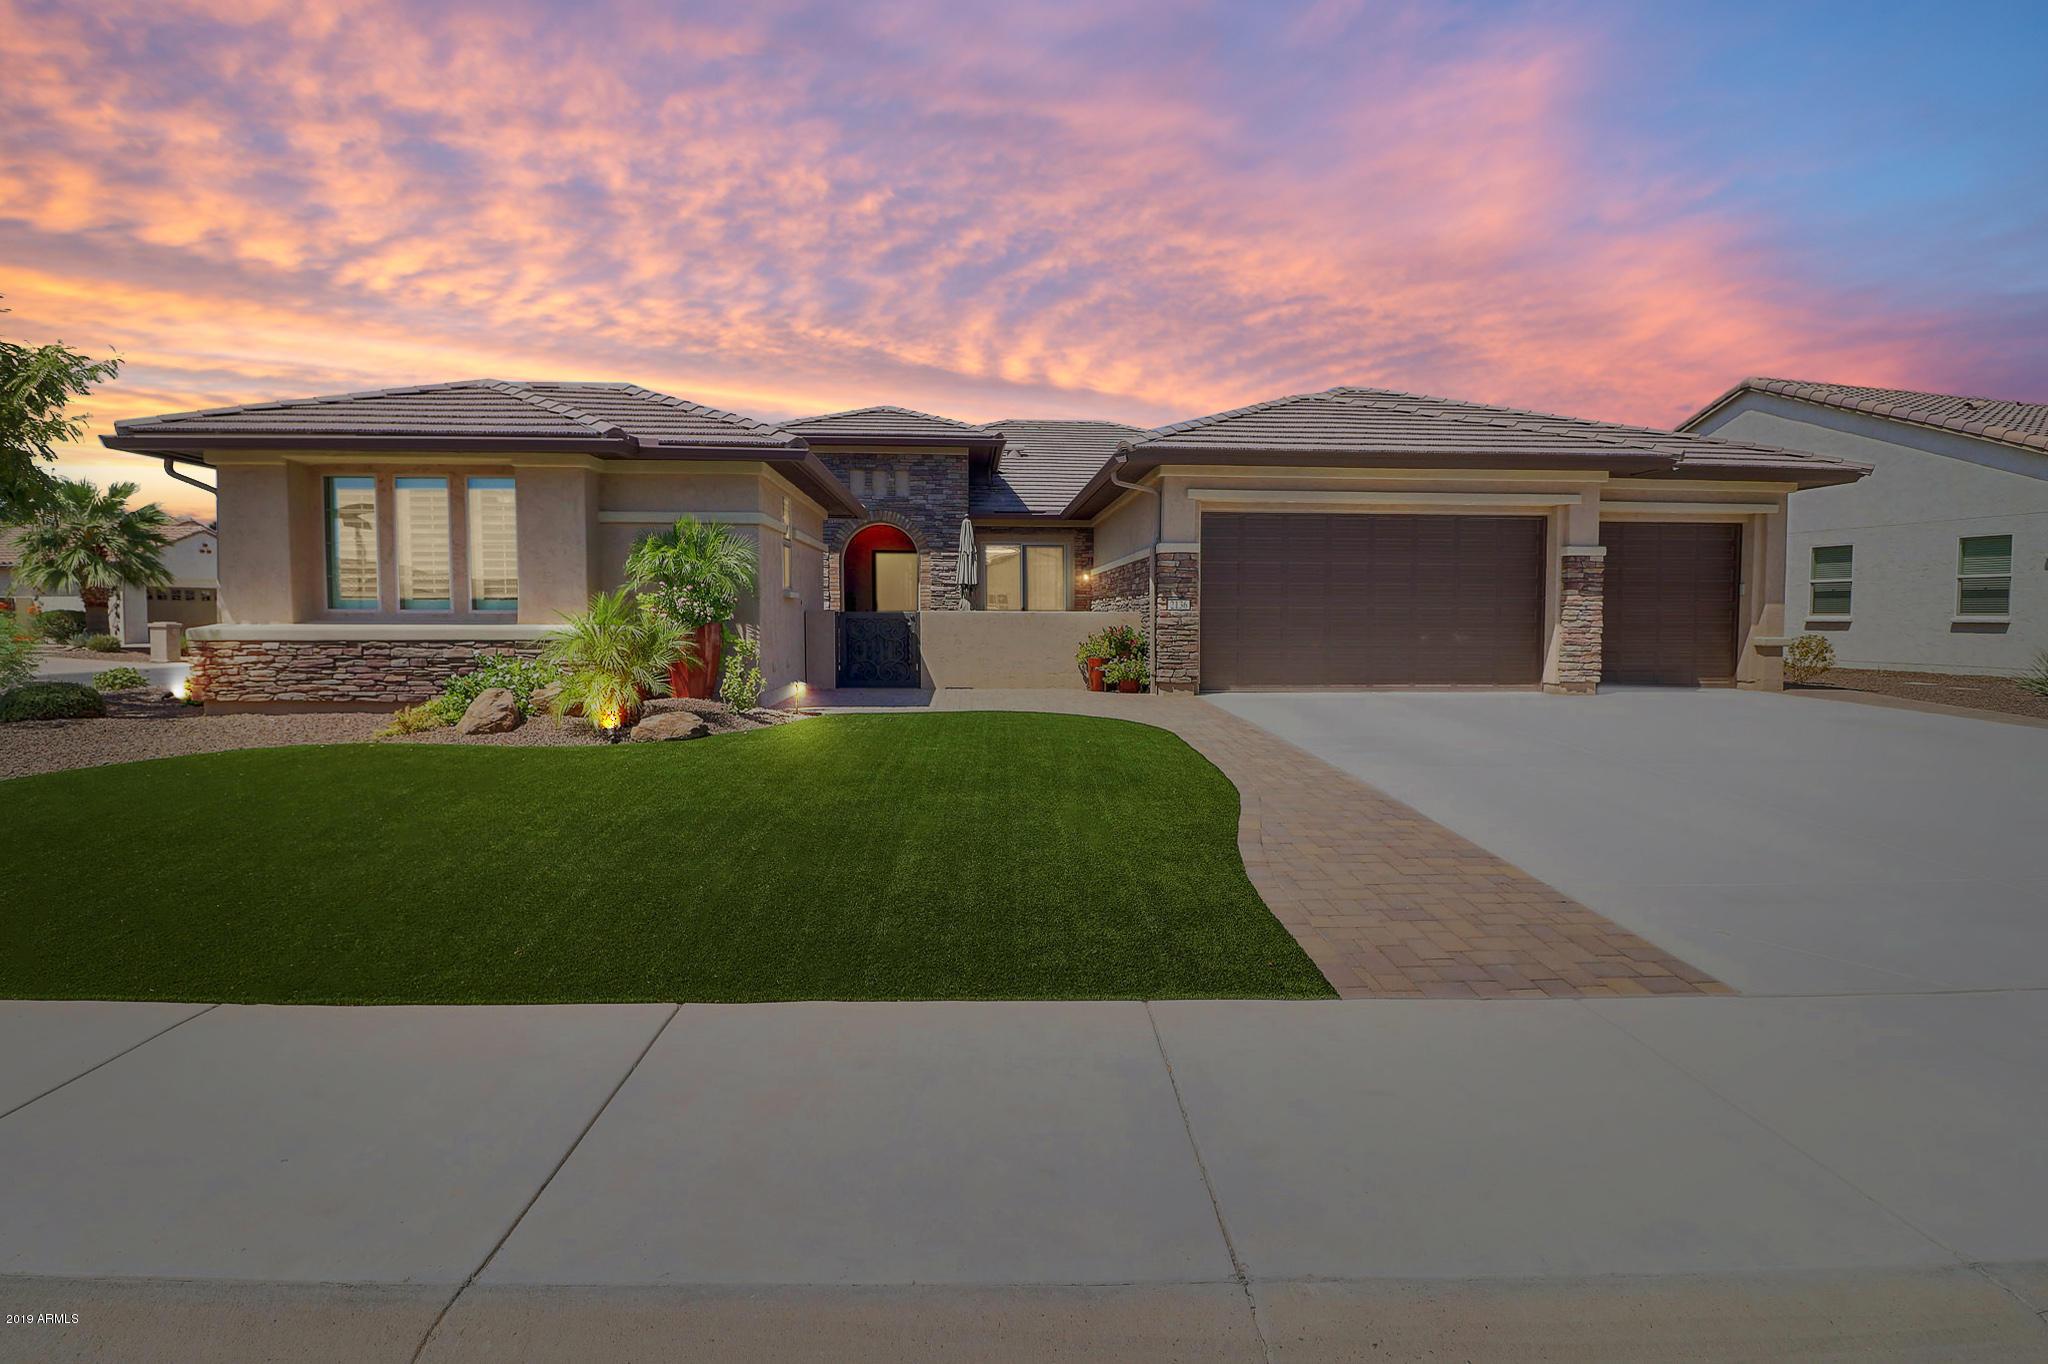 Photo of 2136 N 164TH Drive, Goodyear, AZ 85395